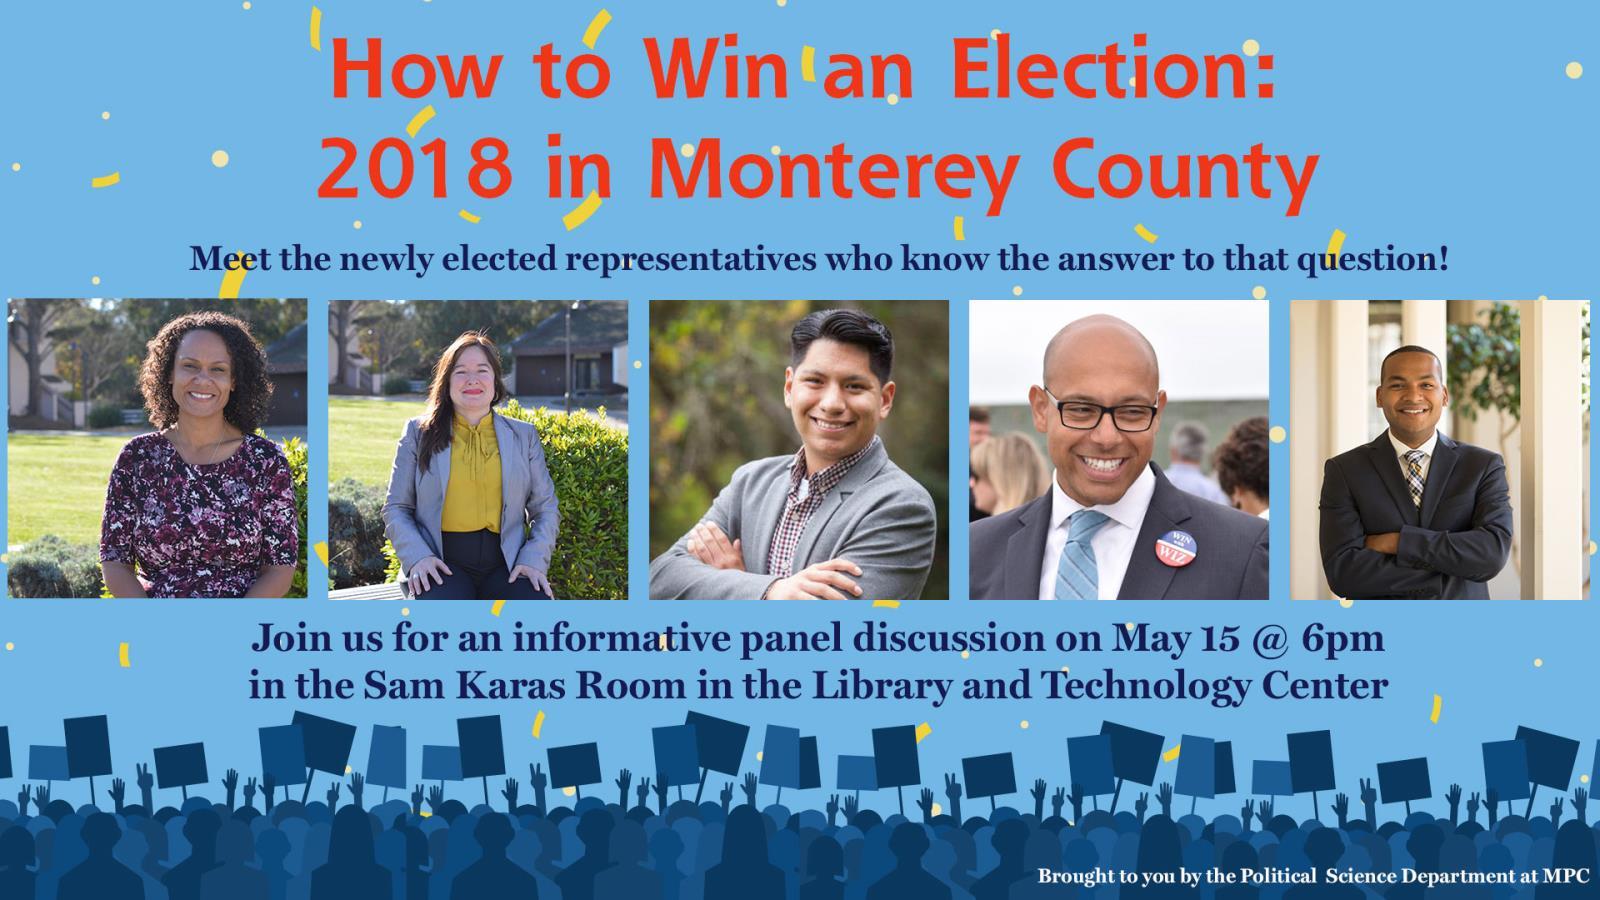 Monterey School District Calendar 2021-2022 How to Win an Election: 2018 in Monterey County   Calendar